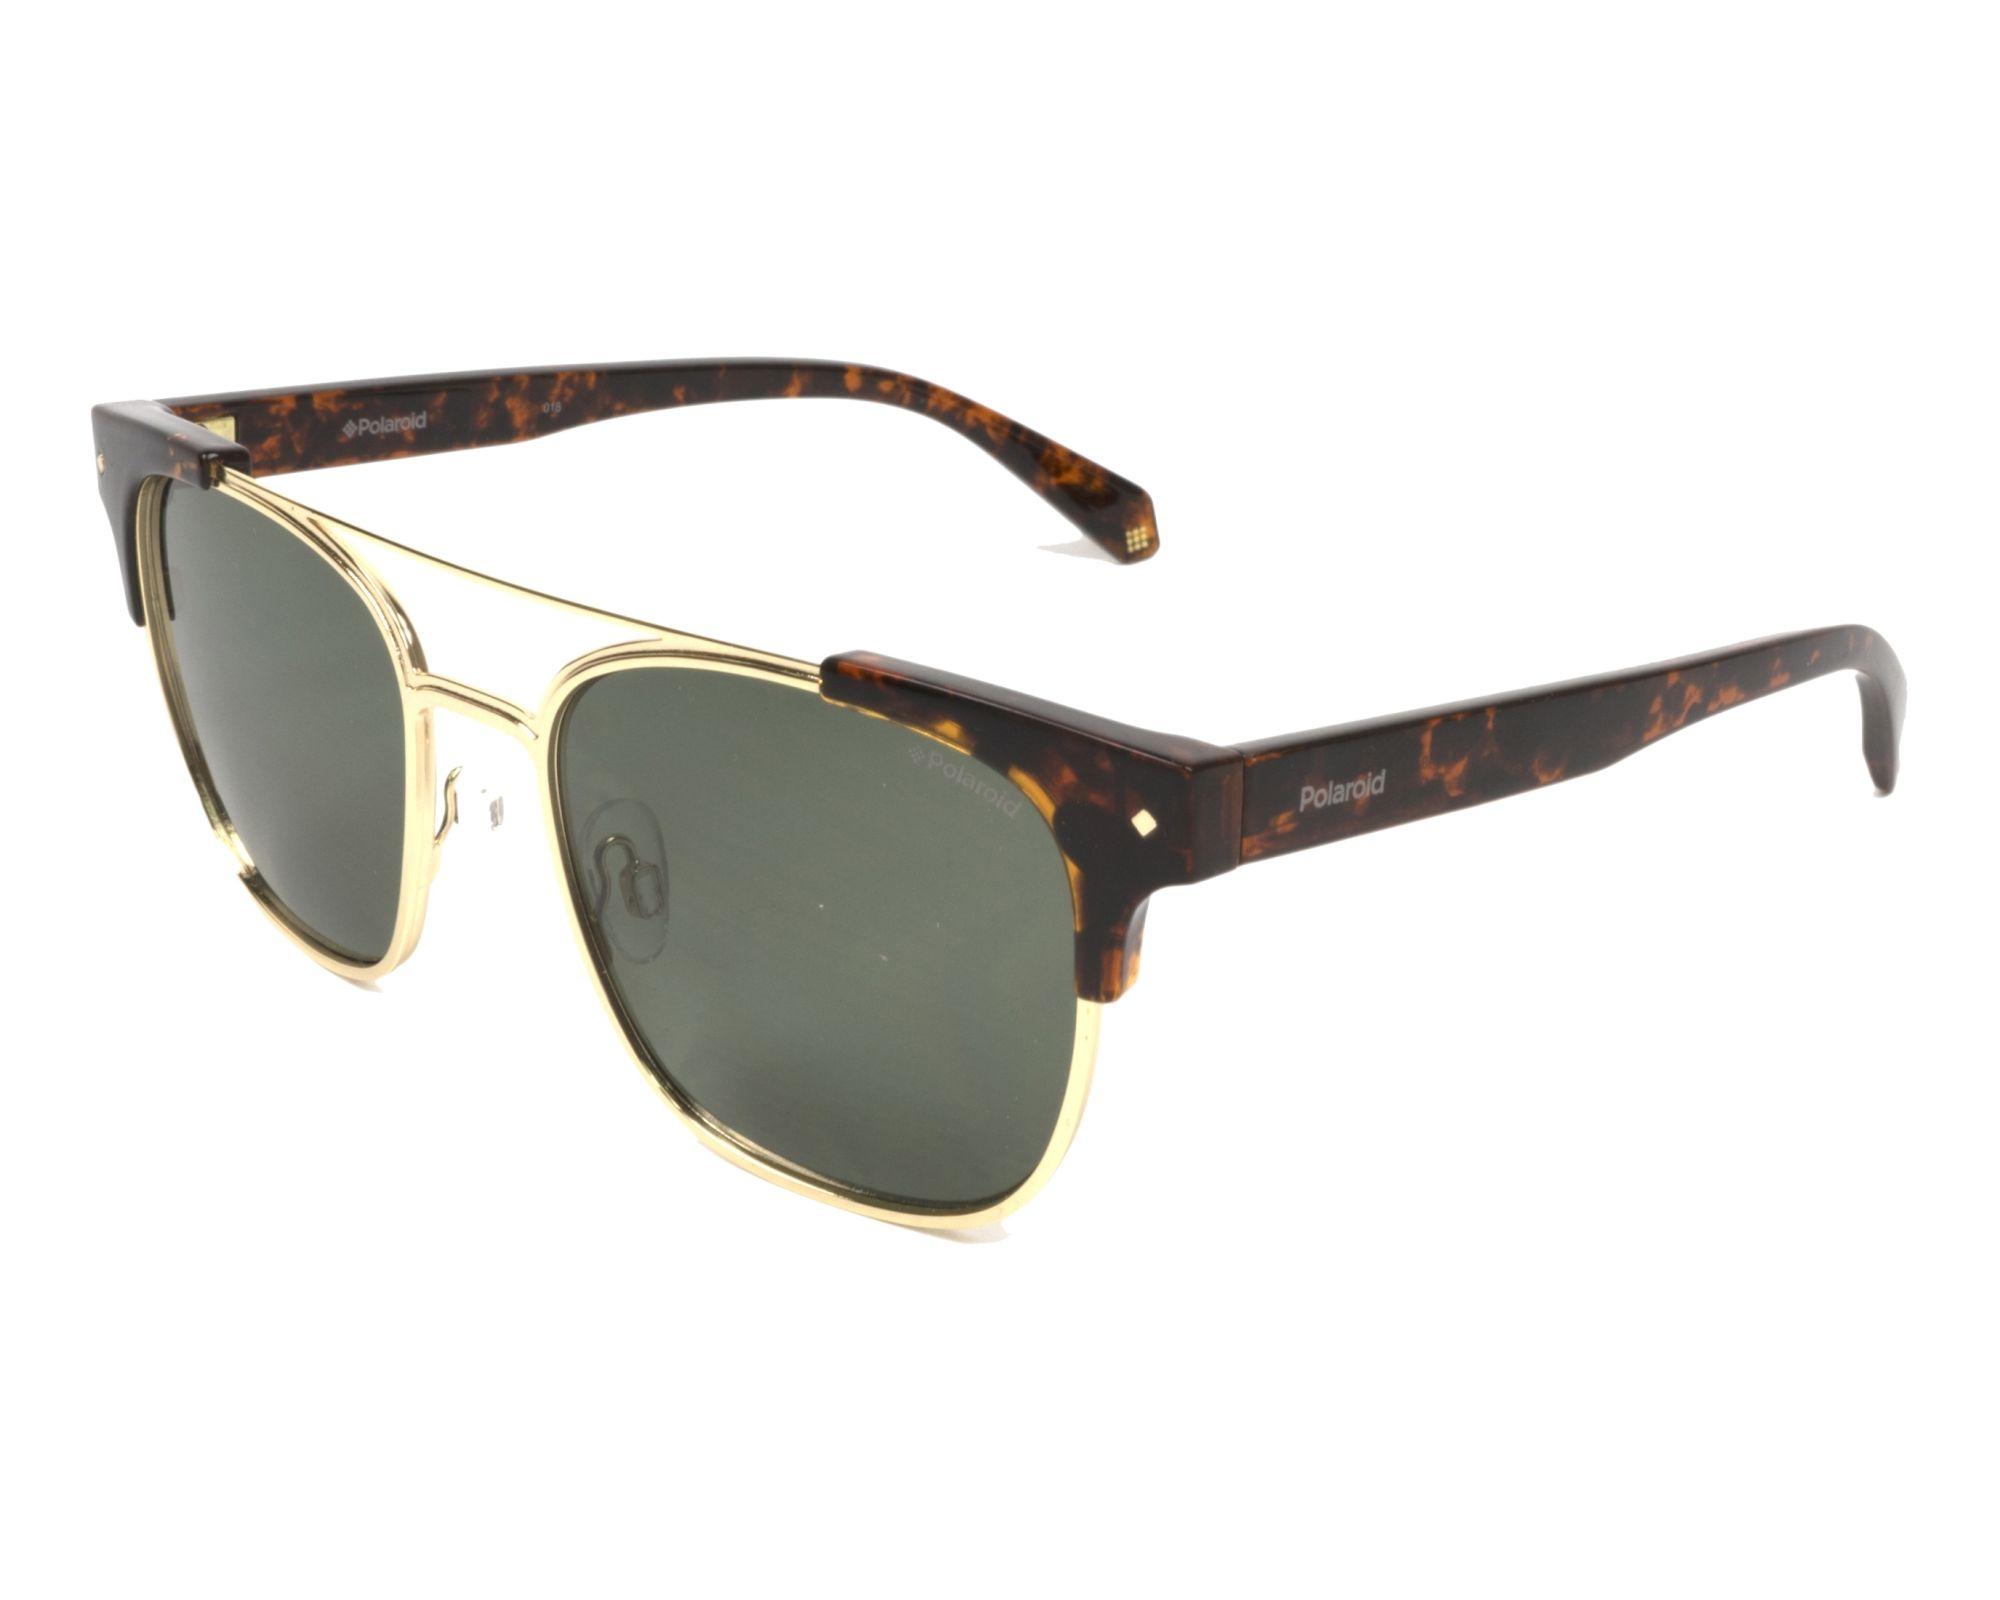 Sunglasses Polaroid PLD-6039-S-X 086 UC 54-18 Havana Gold profile ea8fdd84cf